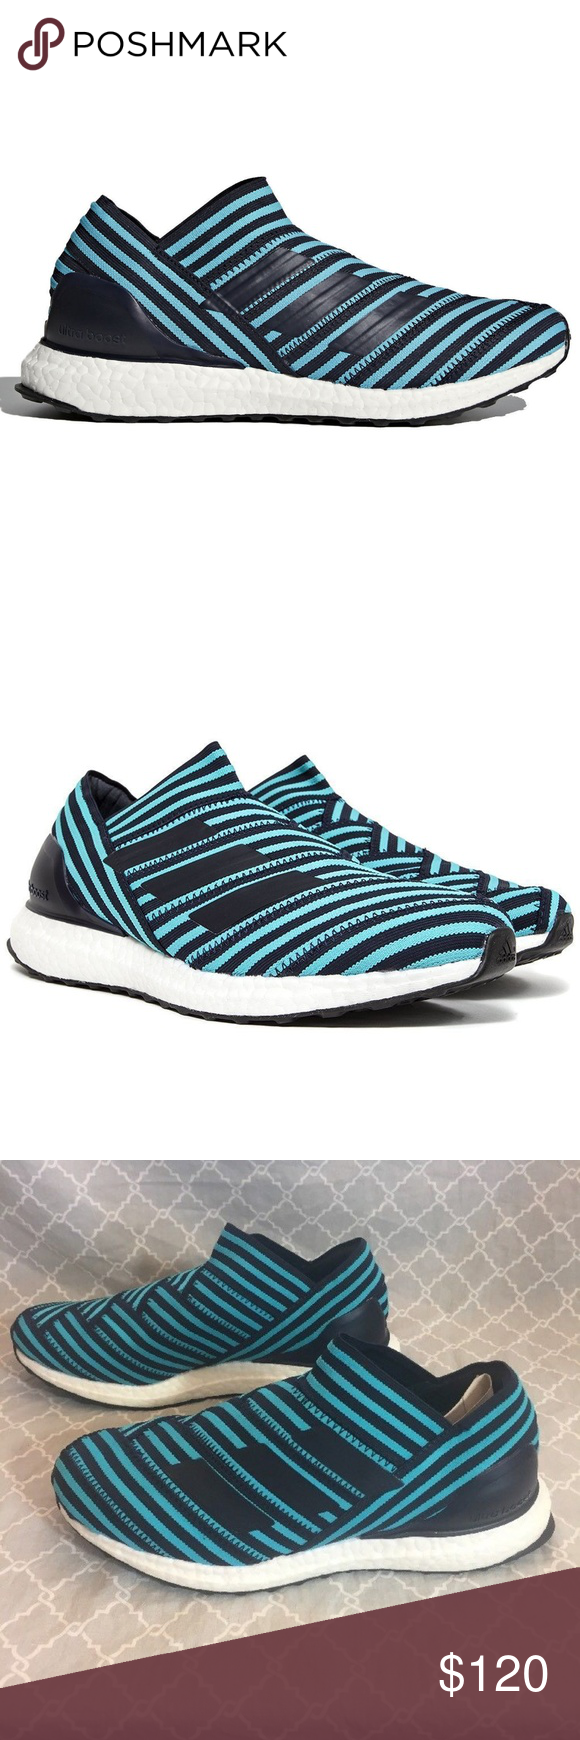 43de62223 Adidas Mens Nemeziz Tango 17+ CG3658 Size 7.5 Adidas Nemeziz Tango 17+ 360  Agility